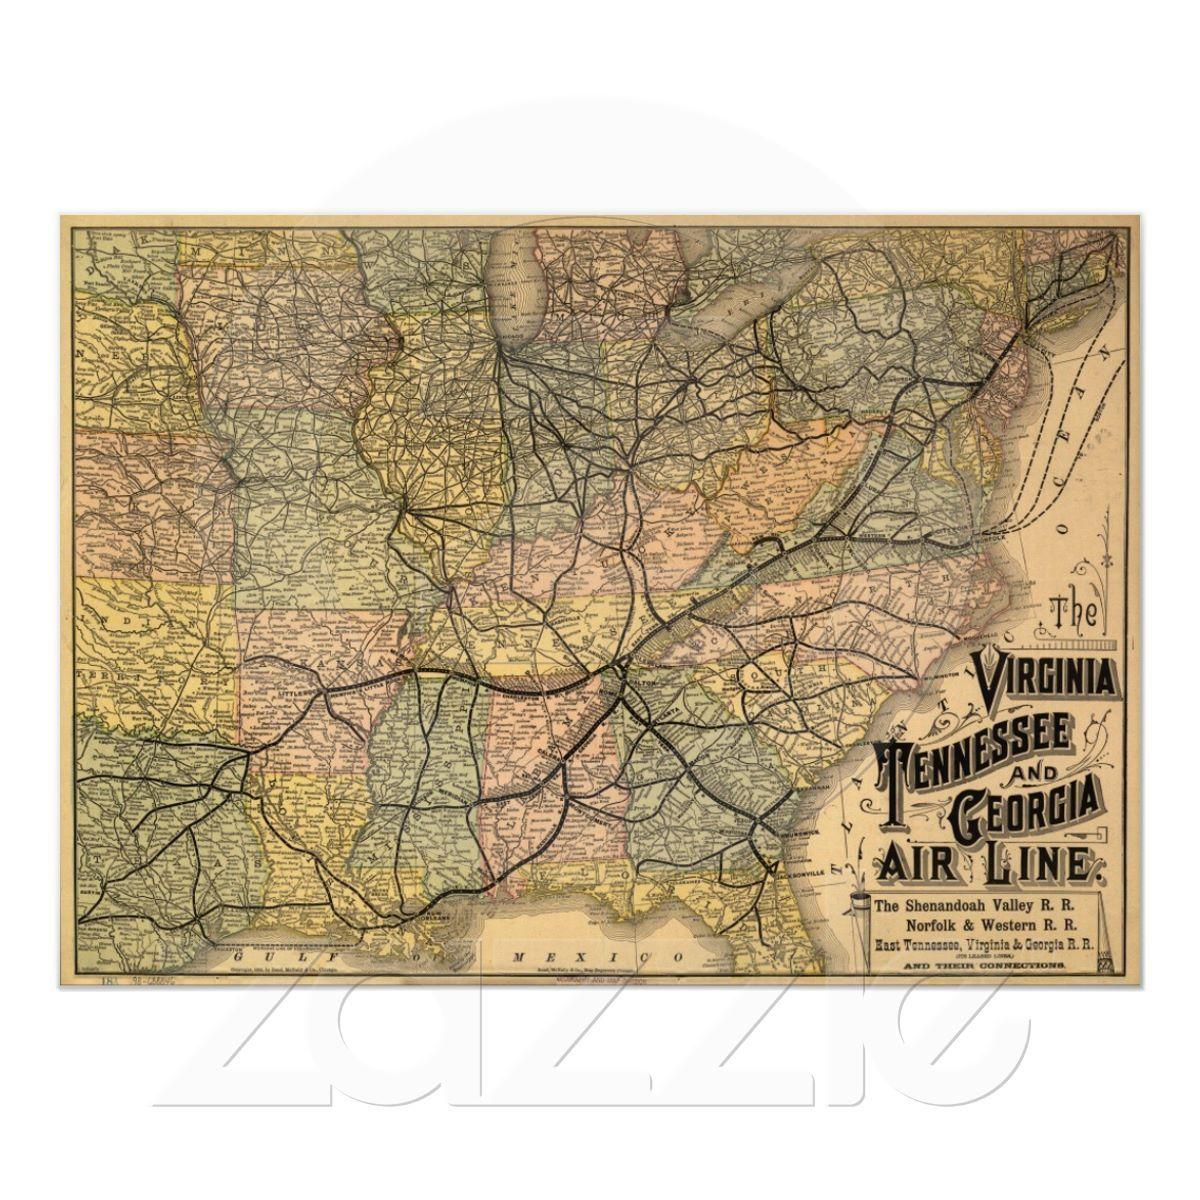 Railroad Map Of Georgia.Virginia Tennessee Georgia Railroad Map 1882 Poster Zazzle Com